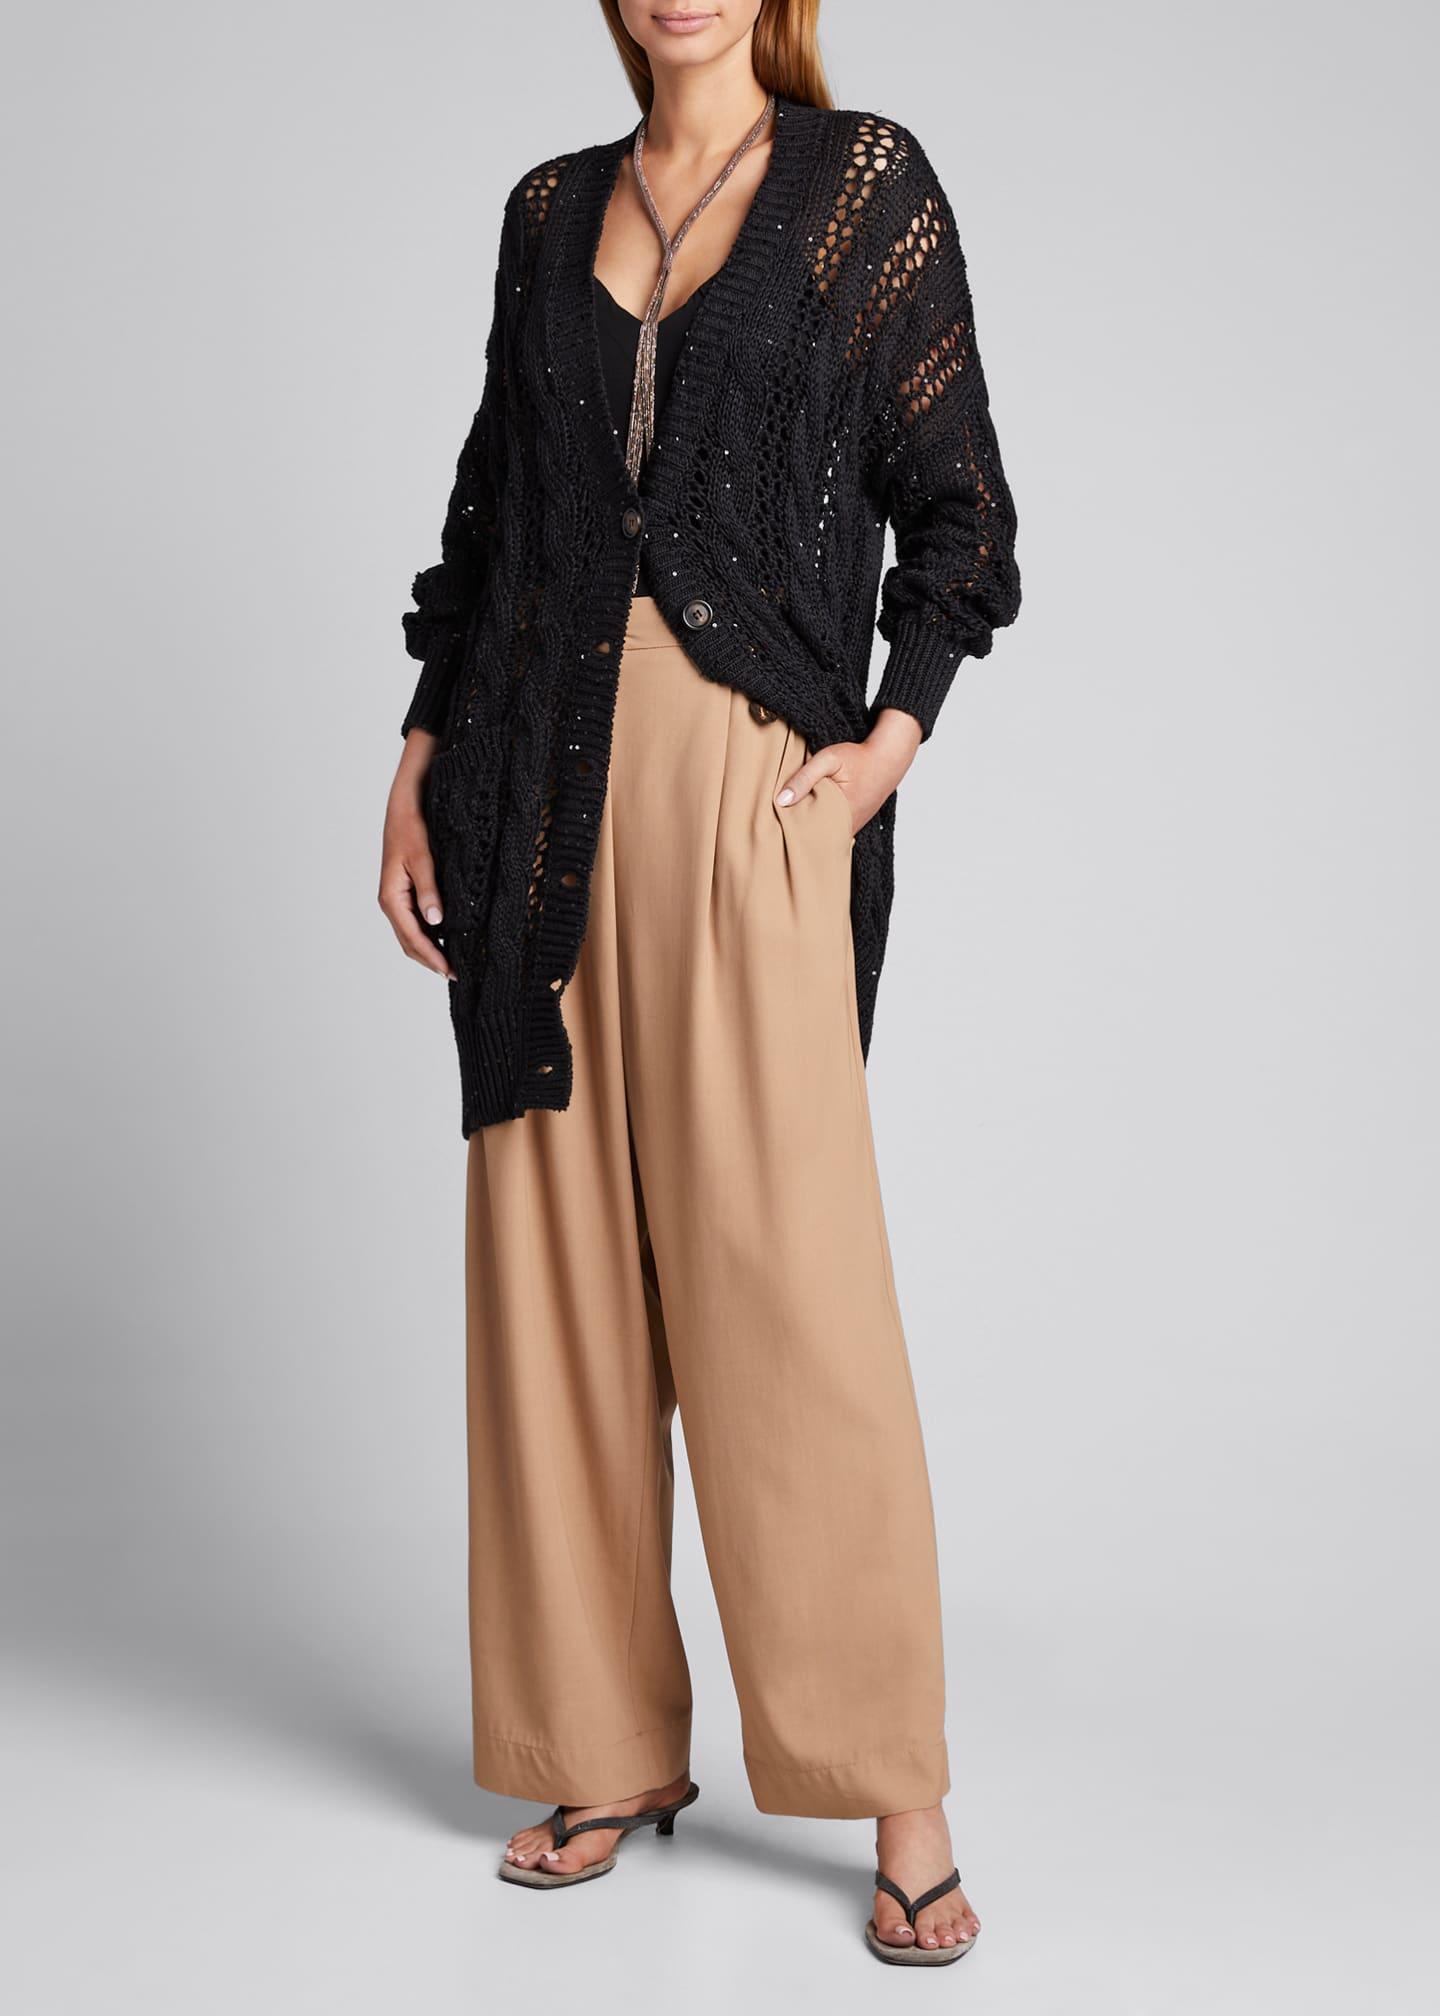 Brunello Cucinelli Sequin Netted Linen-Silk Long Cardigan